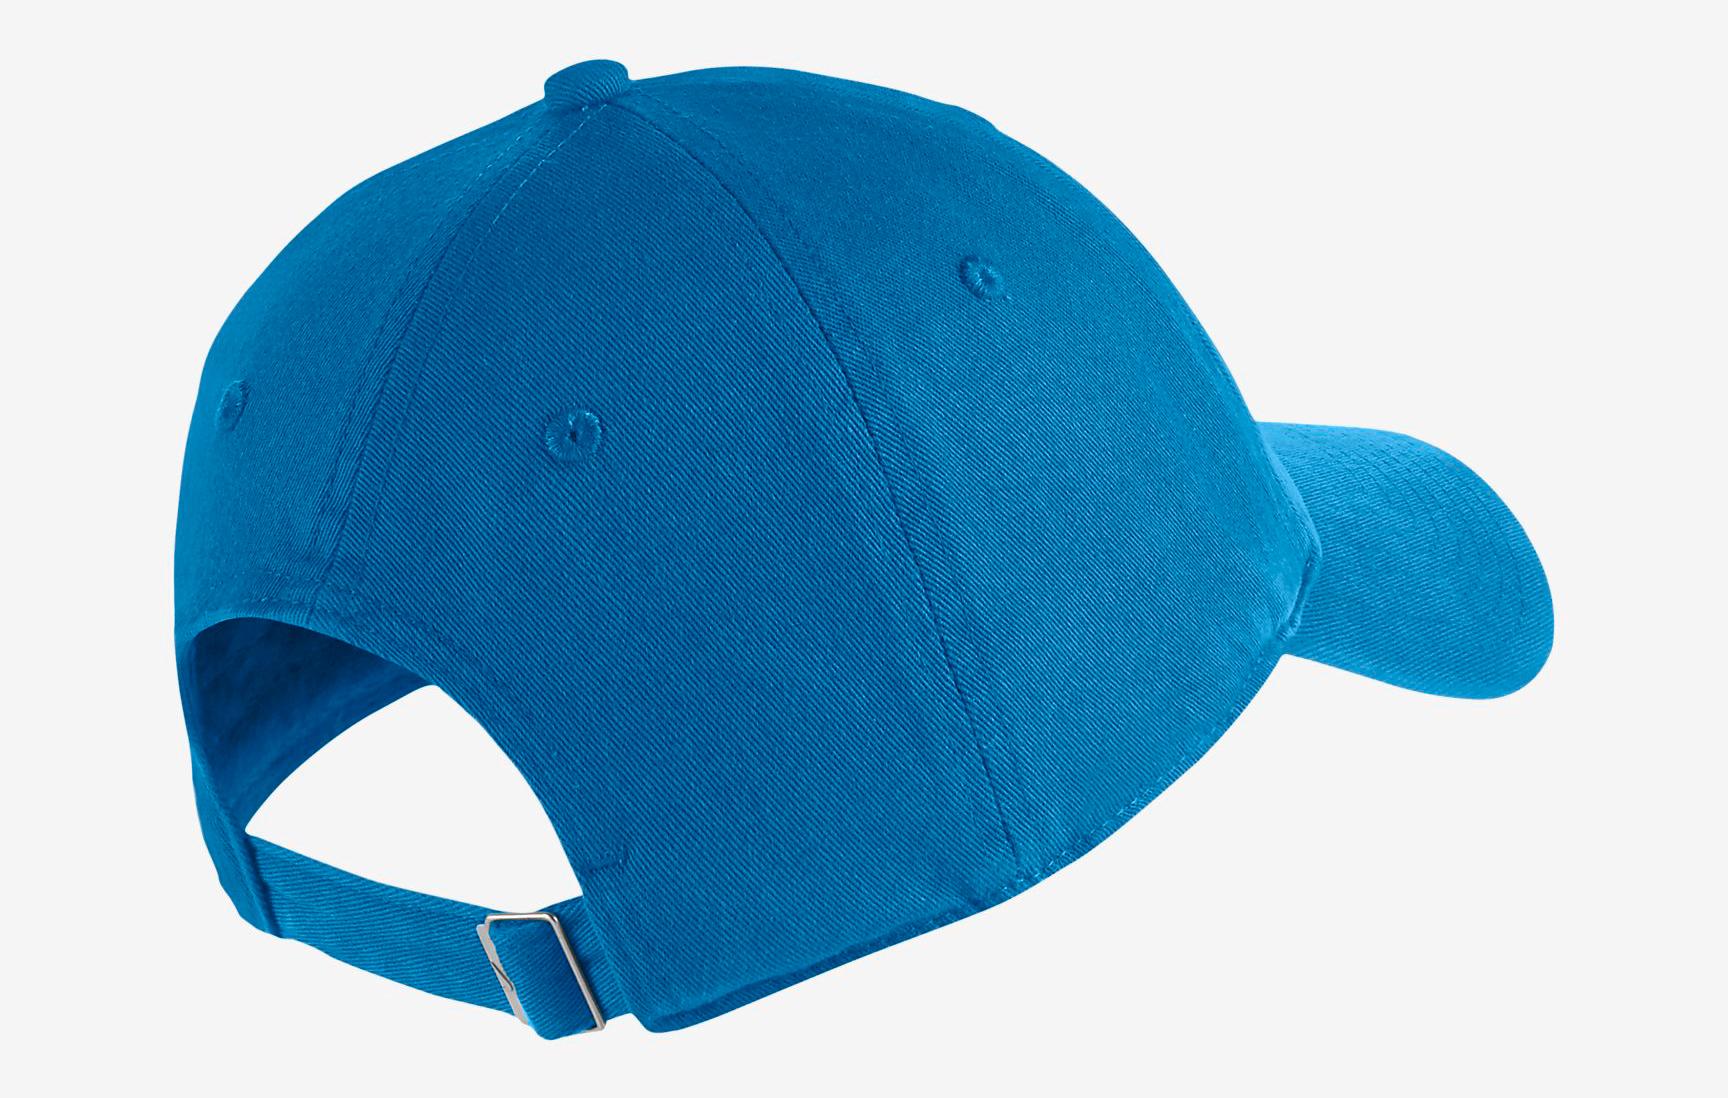 nike watermelon south beach hat match blue 2